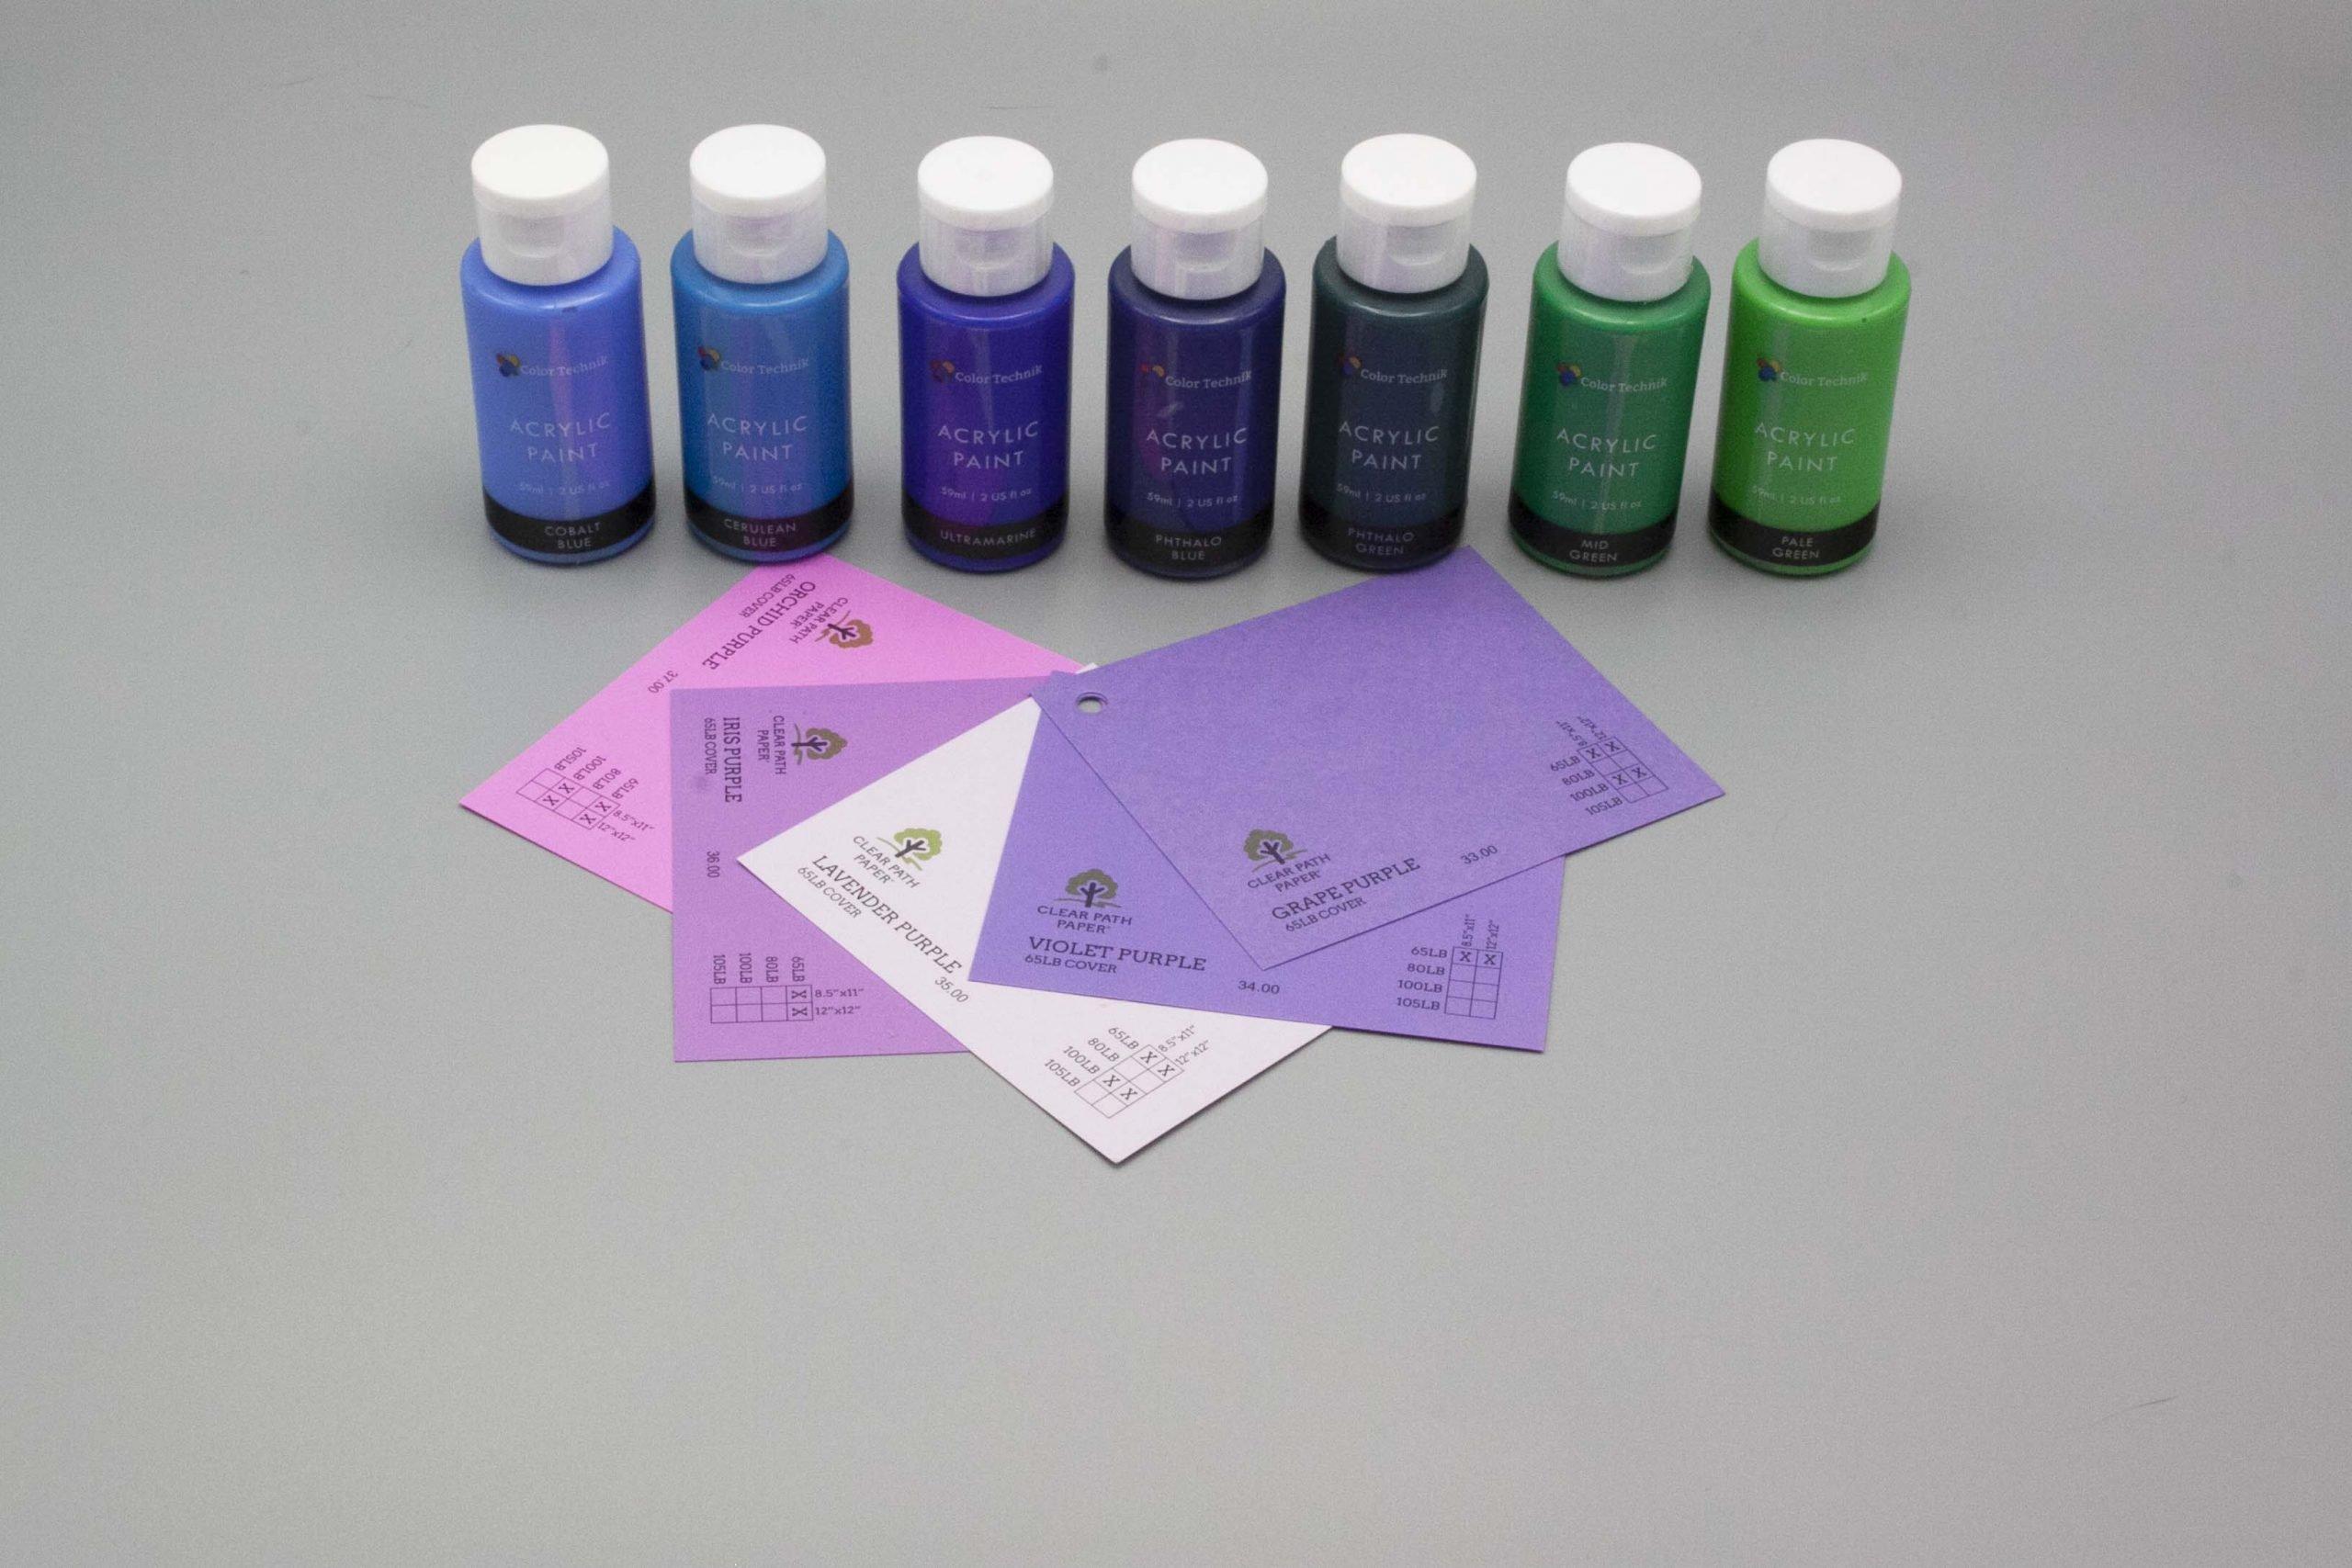 Image of Acrylic Paint on Purple Cardstock